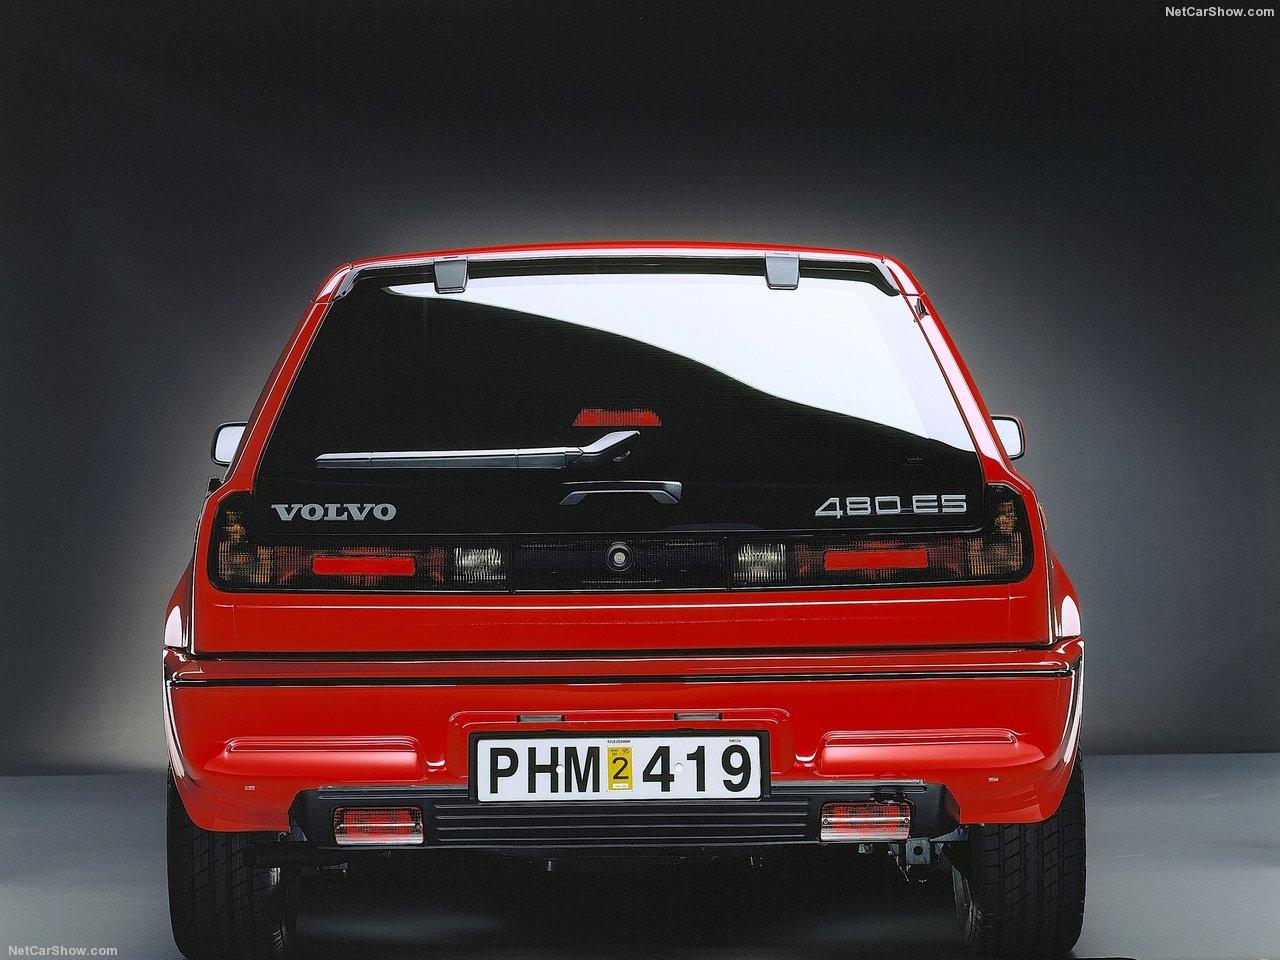 Volvo, Volvo 480, 480, pop-up headlights, classic car, retro car, motoring, automotive, carandclassic.co.uk, carandclassic, not2grand.co.uk, not2grand, adrian flux, retro car, classic Volvo, Volvo Turbo